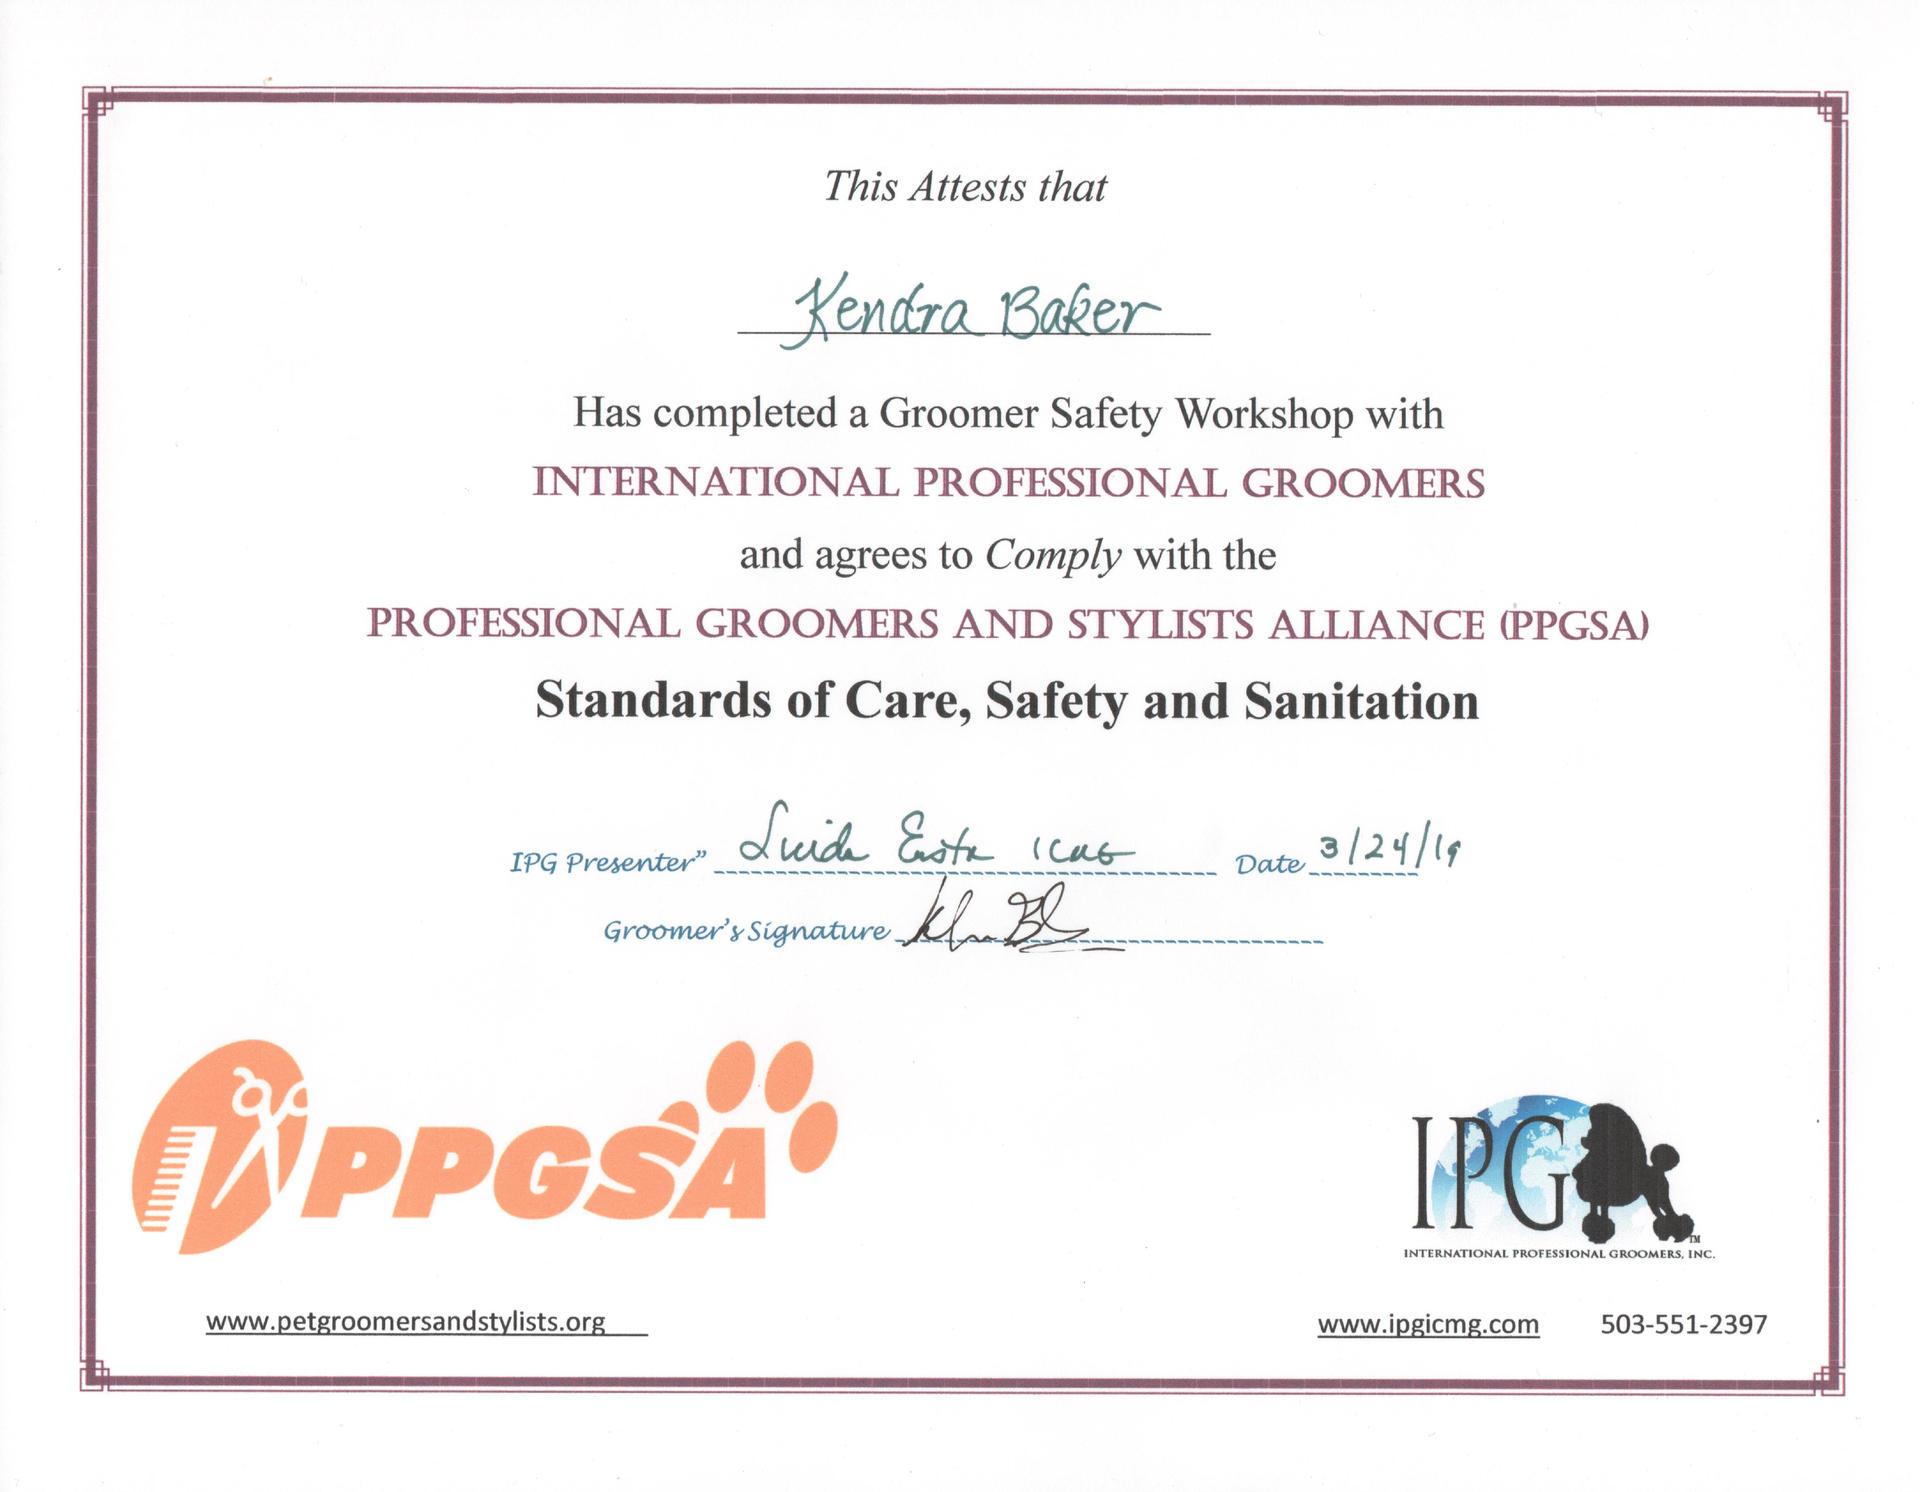 International Professional Groomers Certificate